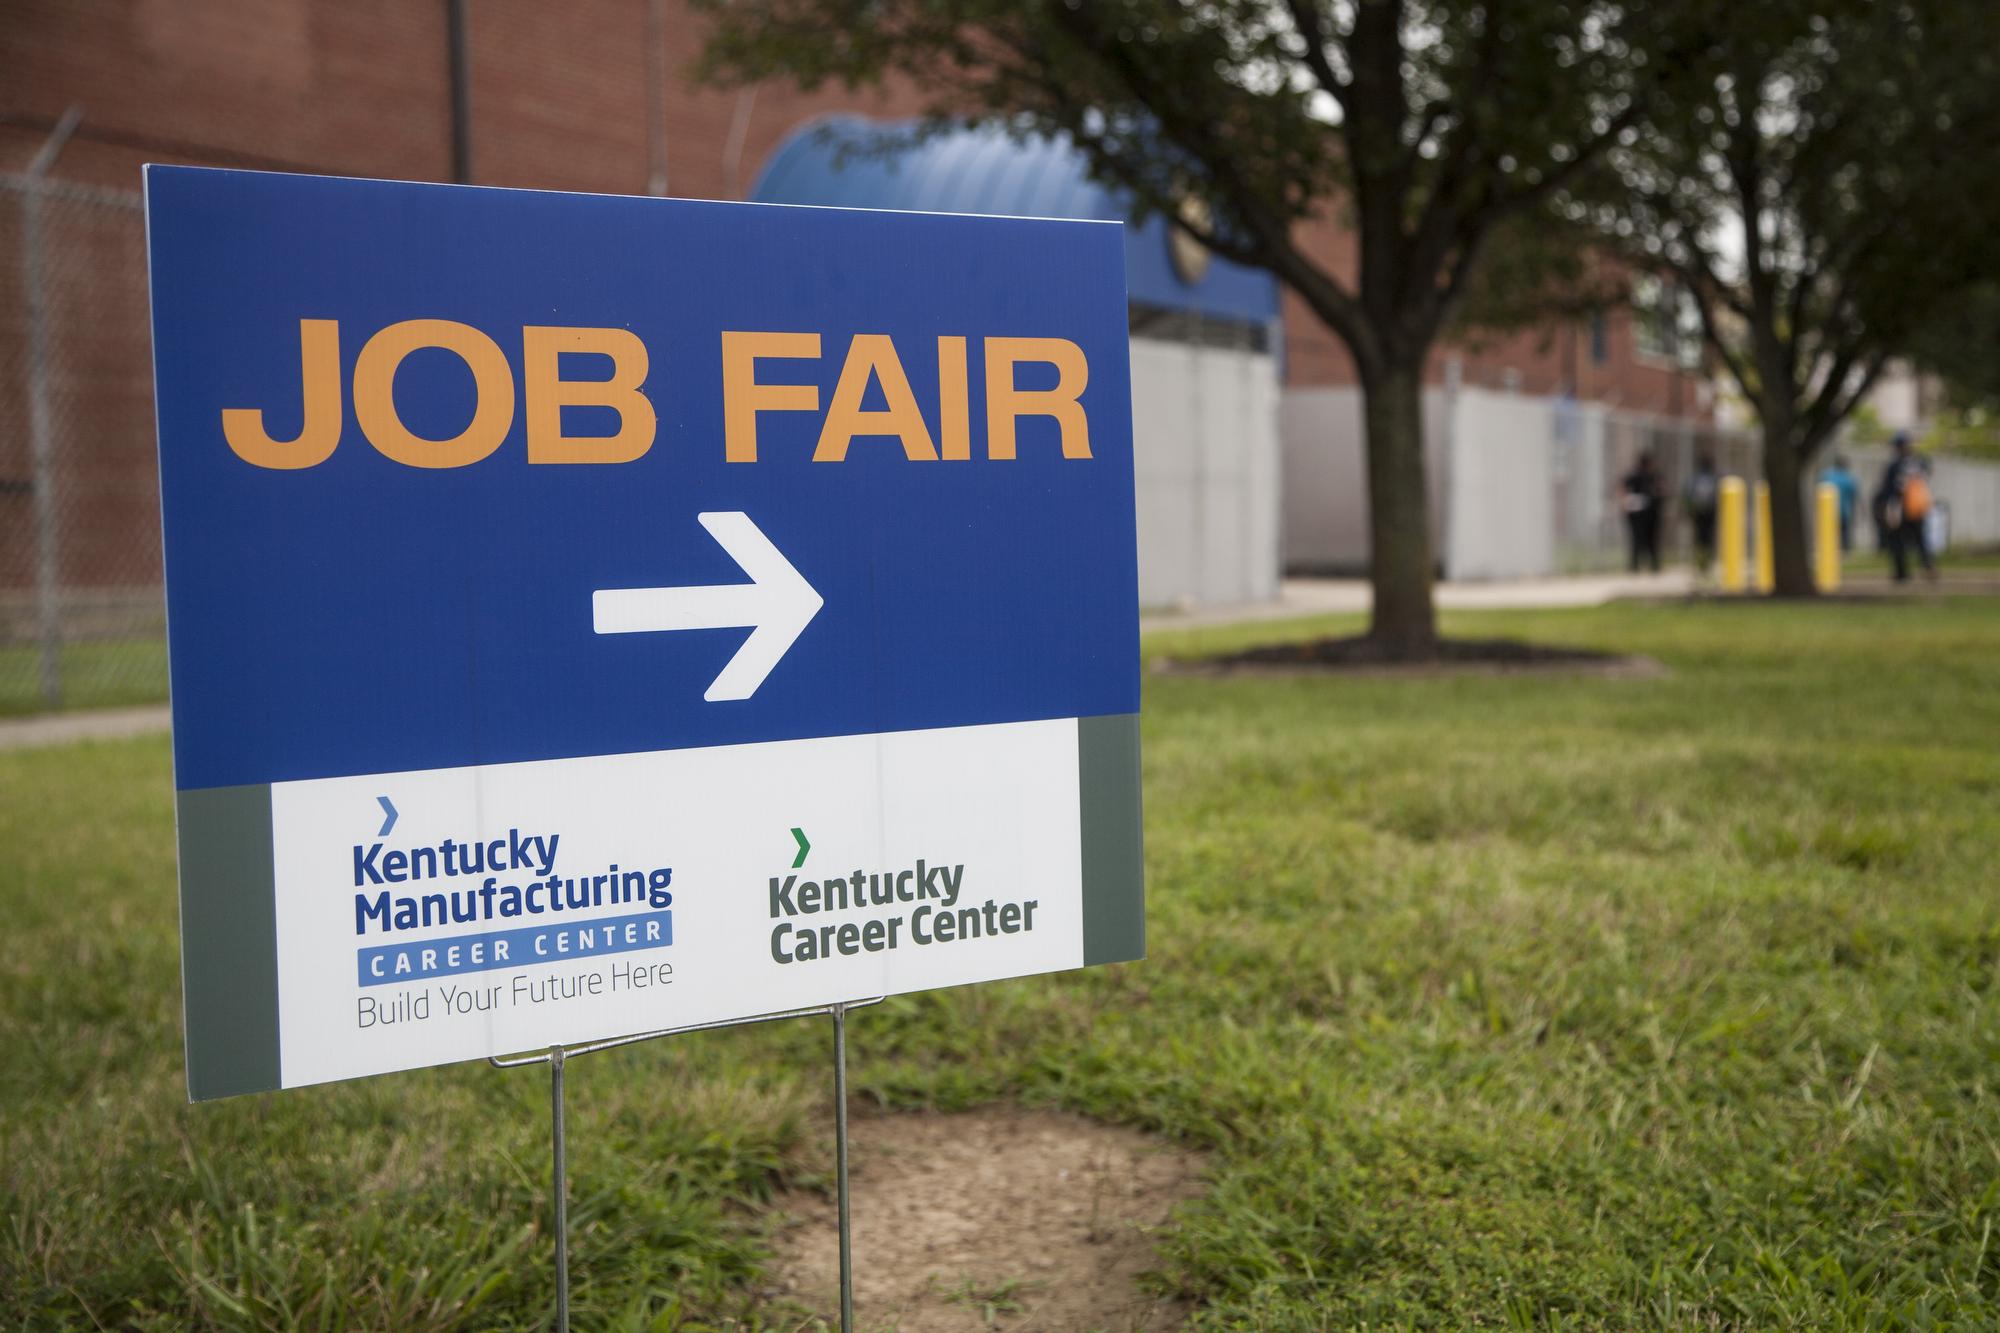 Job Fair sign.jpg